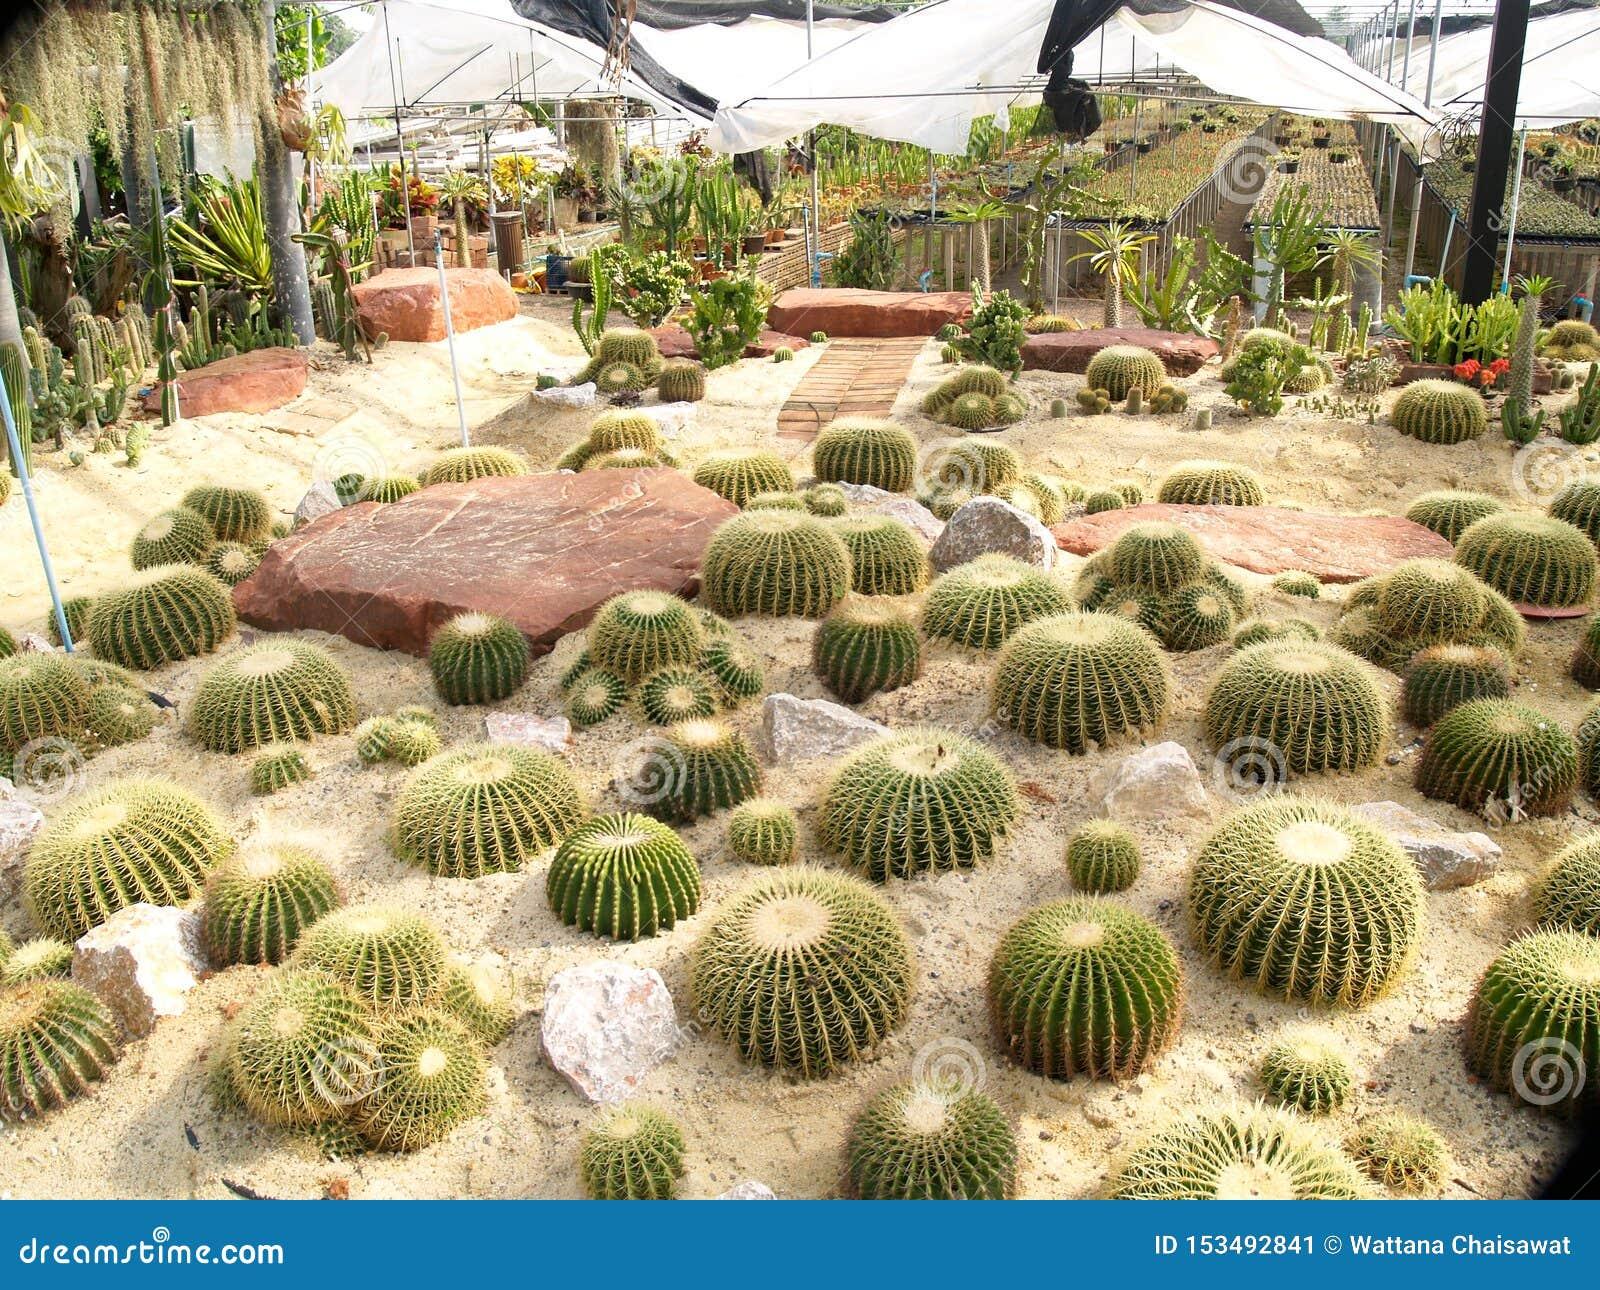 Many cactus trees planted around the large stone